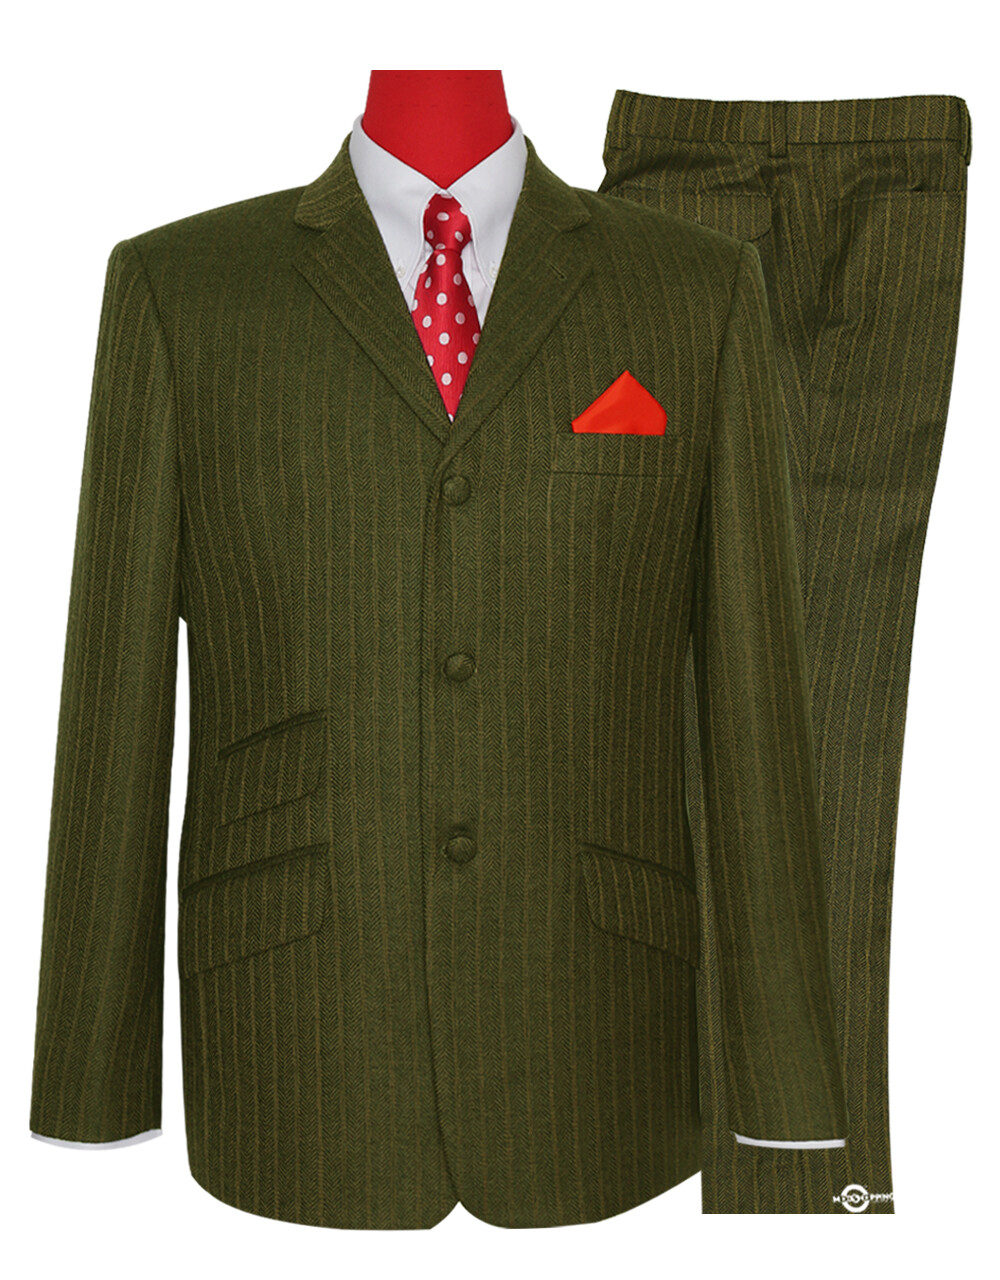 Mod Tweed Suit | Tobacco Colour Herring Bone Suit